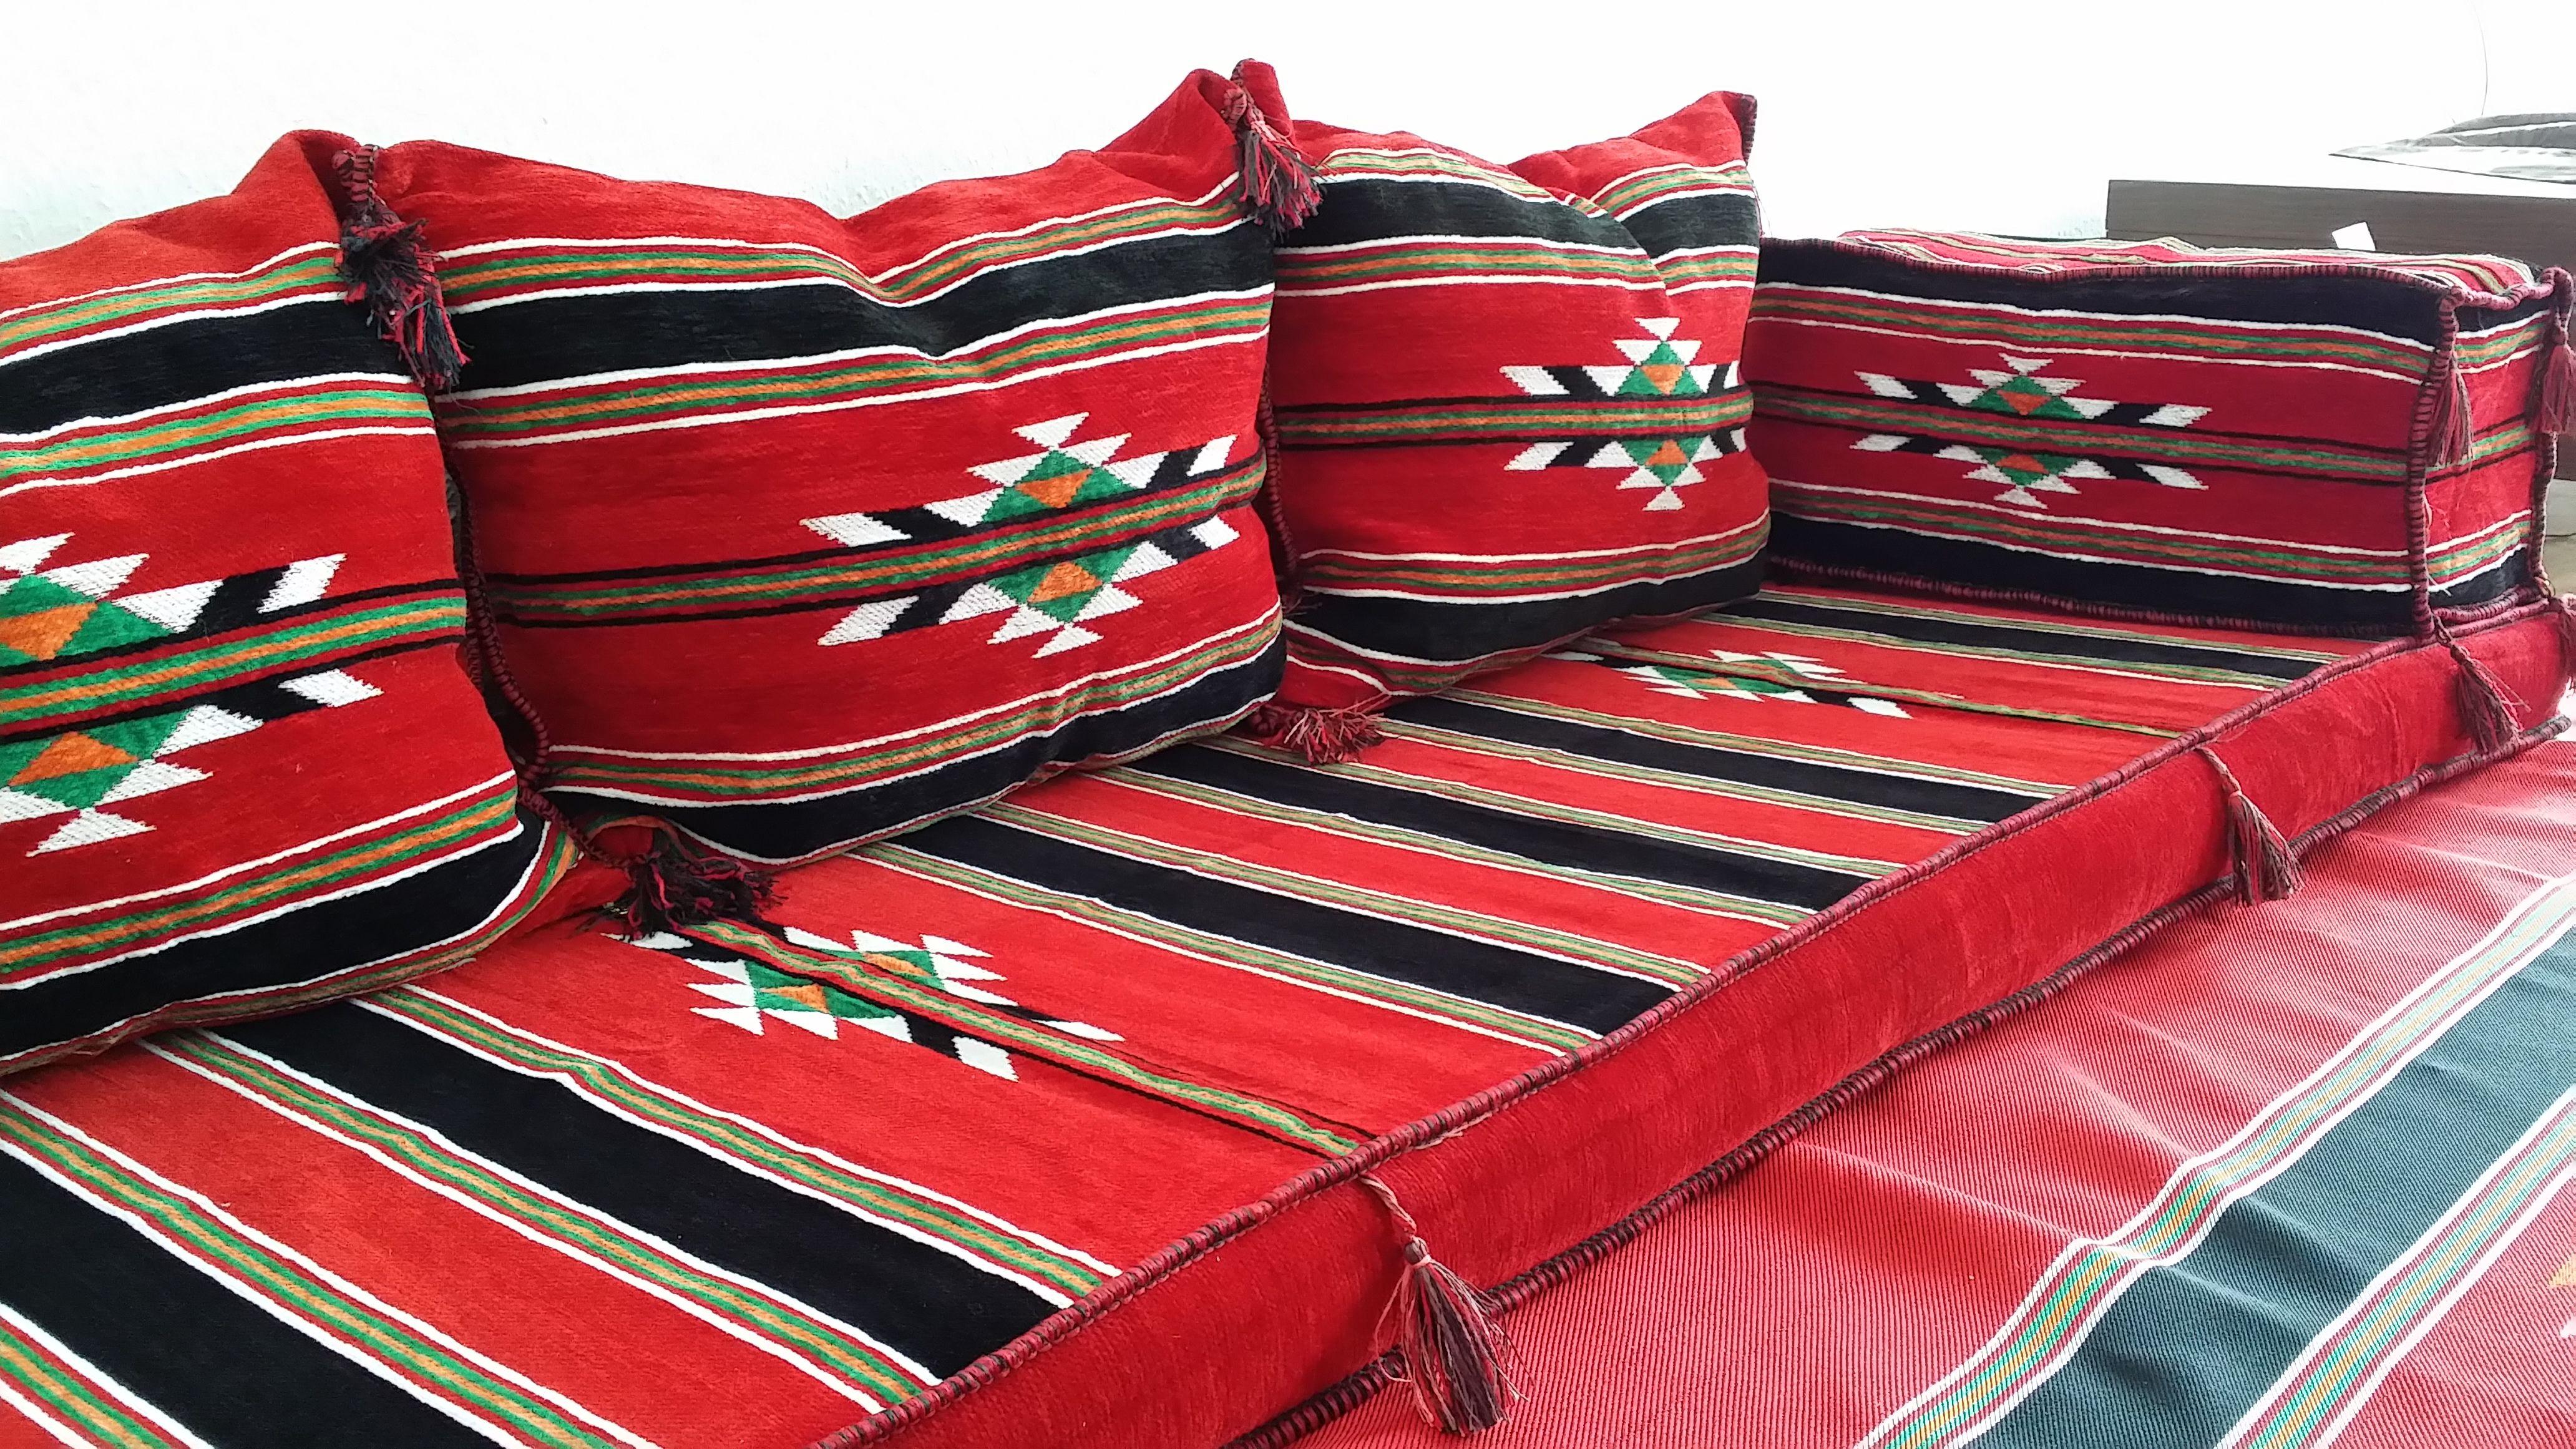 wohnaccessoires ausgefallene m bel m belh user orient. Black Bedroom Furniture Sets. Home Design Ideas